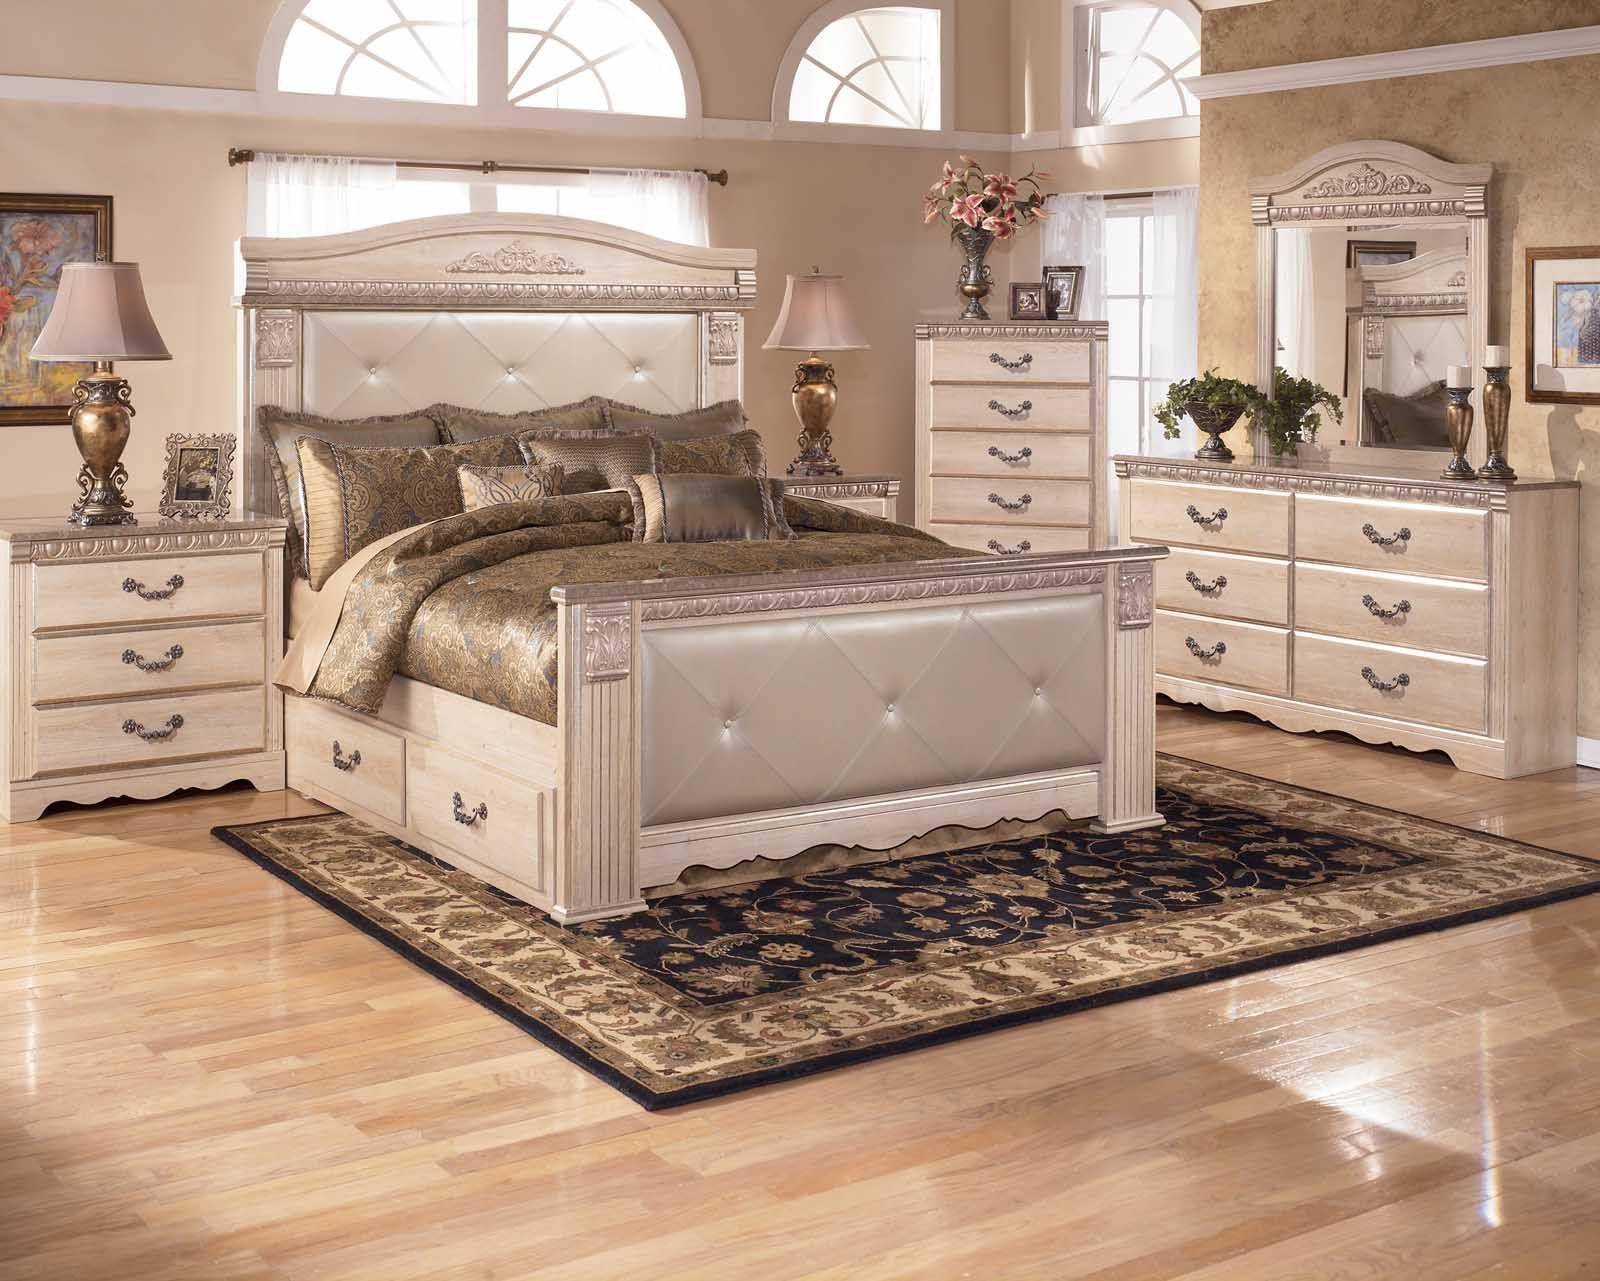 Silverglade Mansion Bedroom Set With Underbed Storage